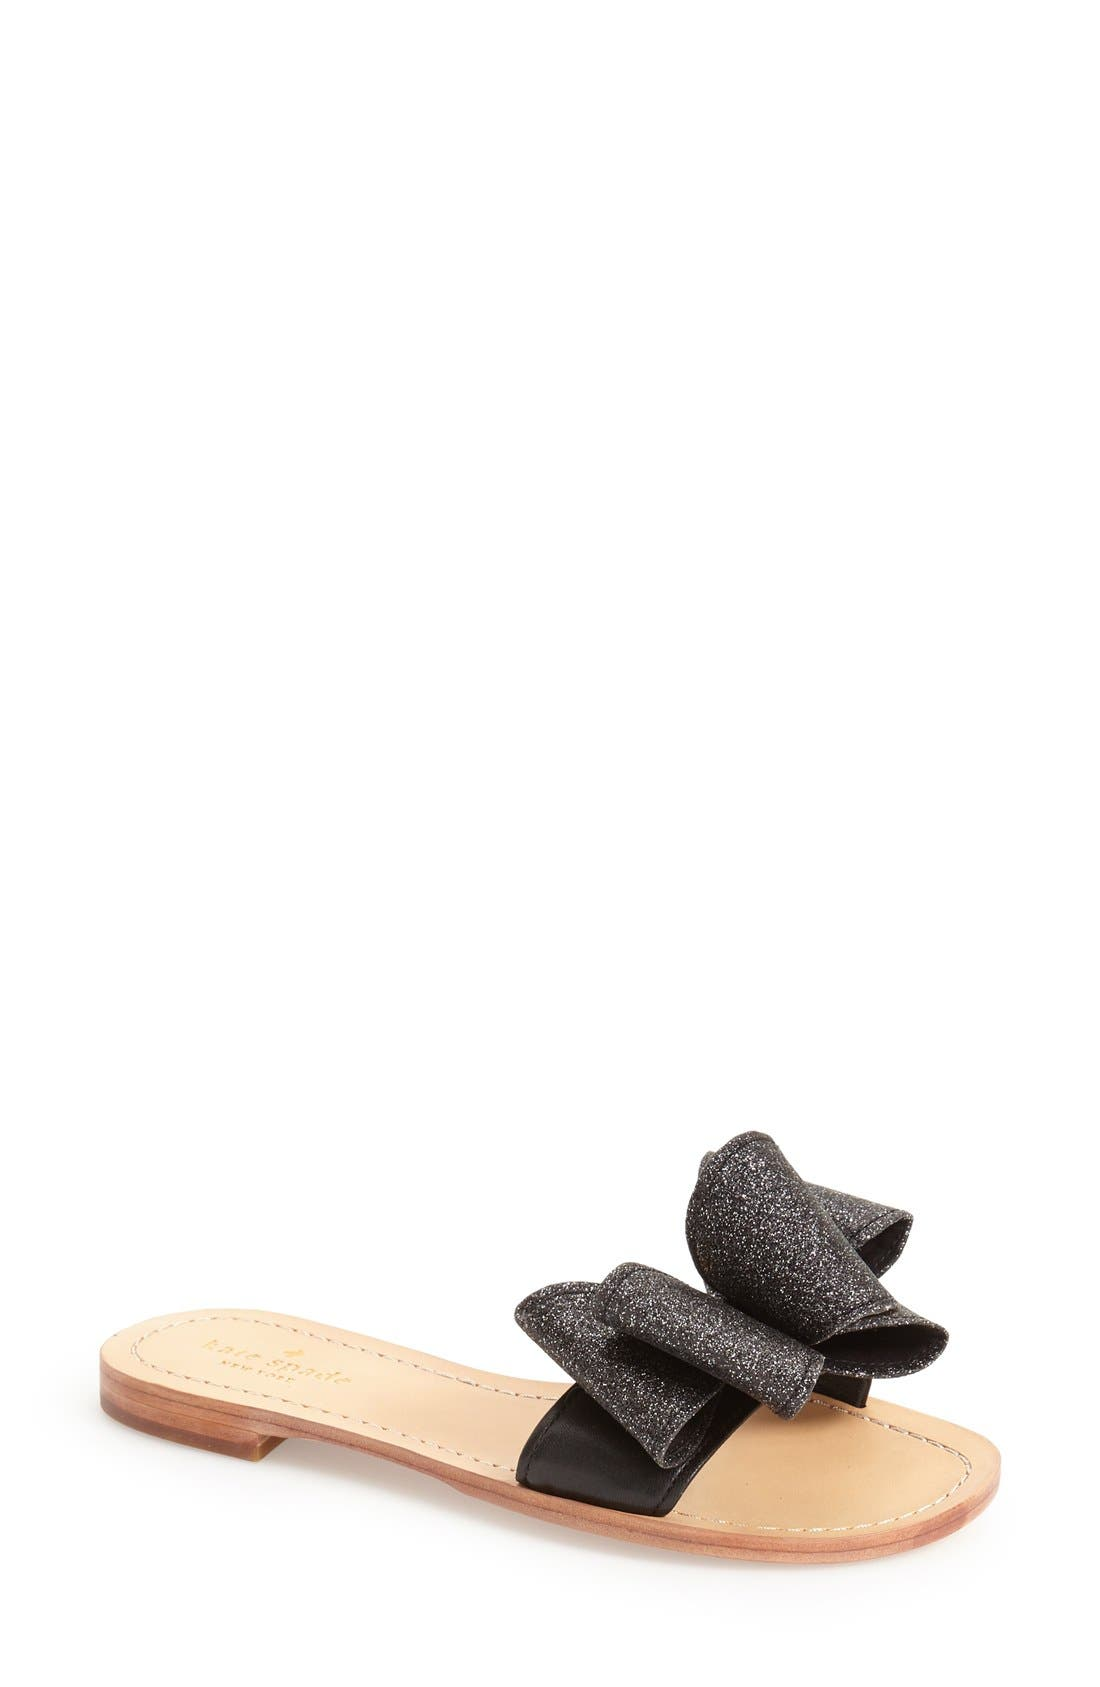 KATE SPADE NEW YORK 'cicely' sandal, Main, color, 006